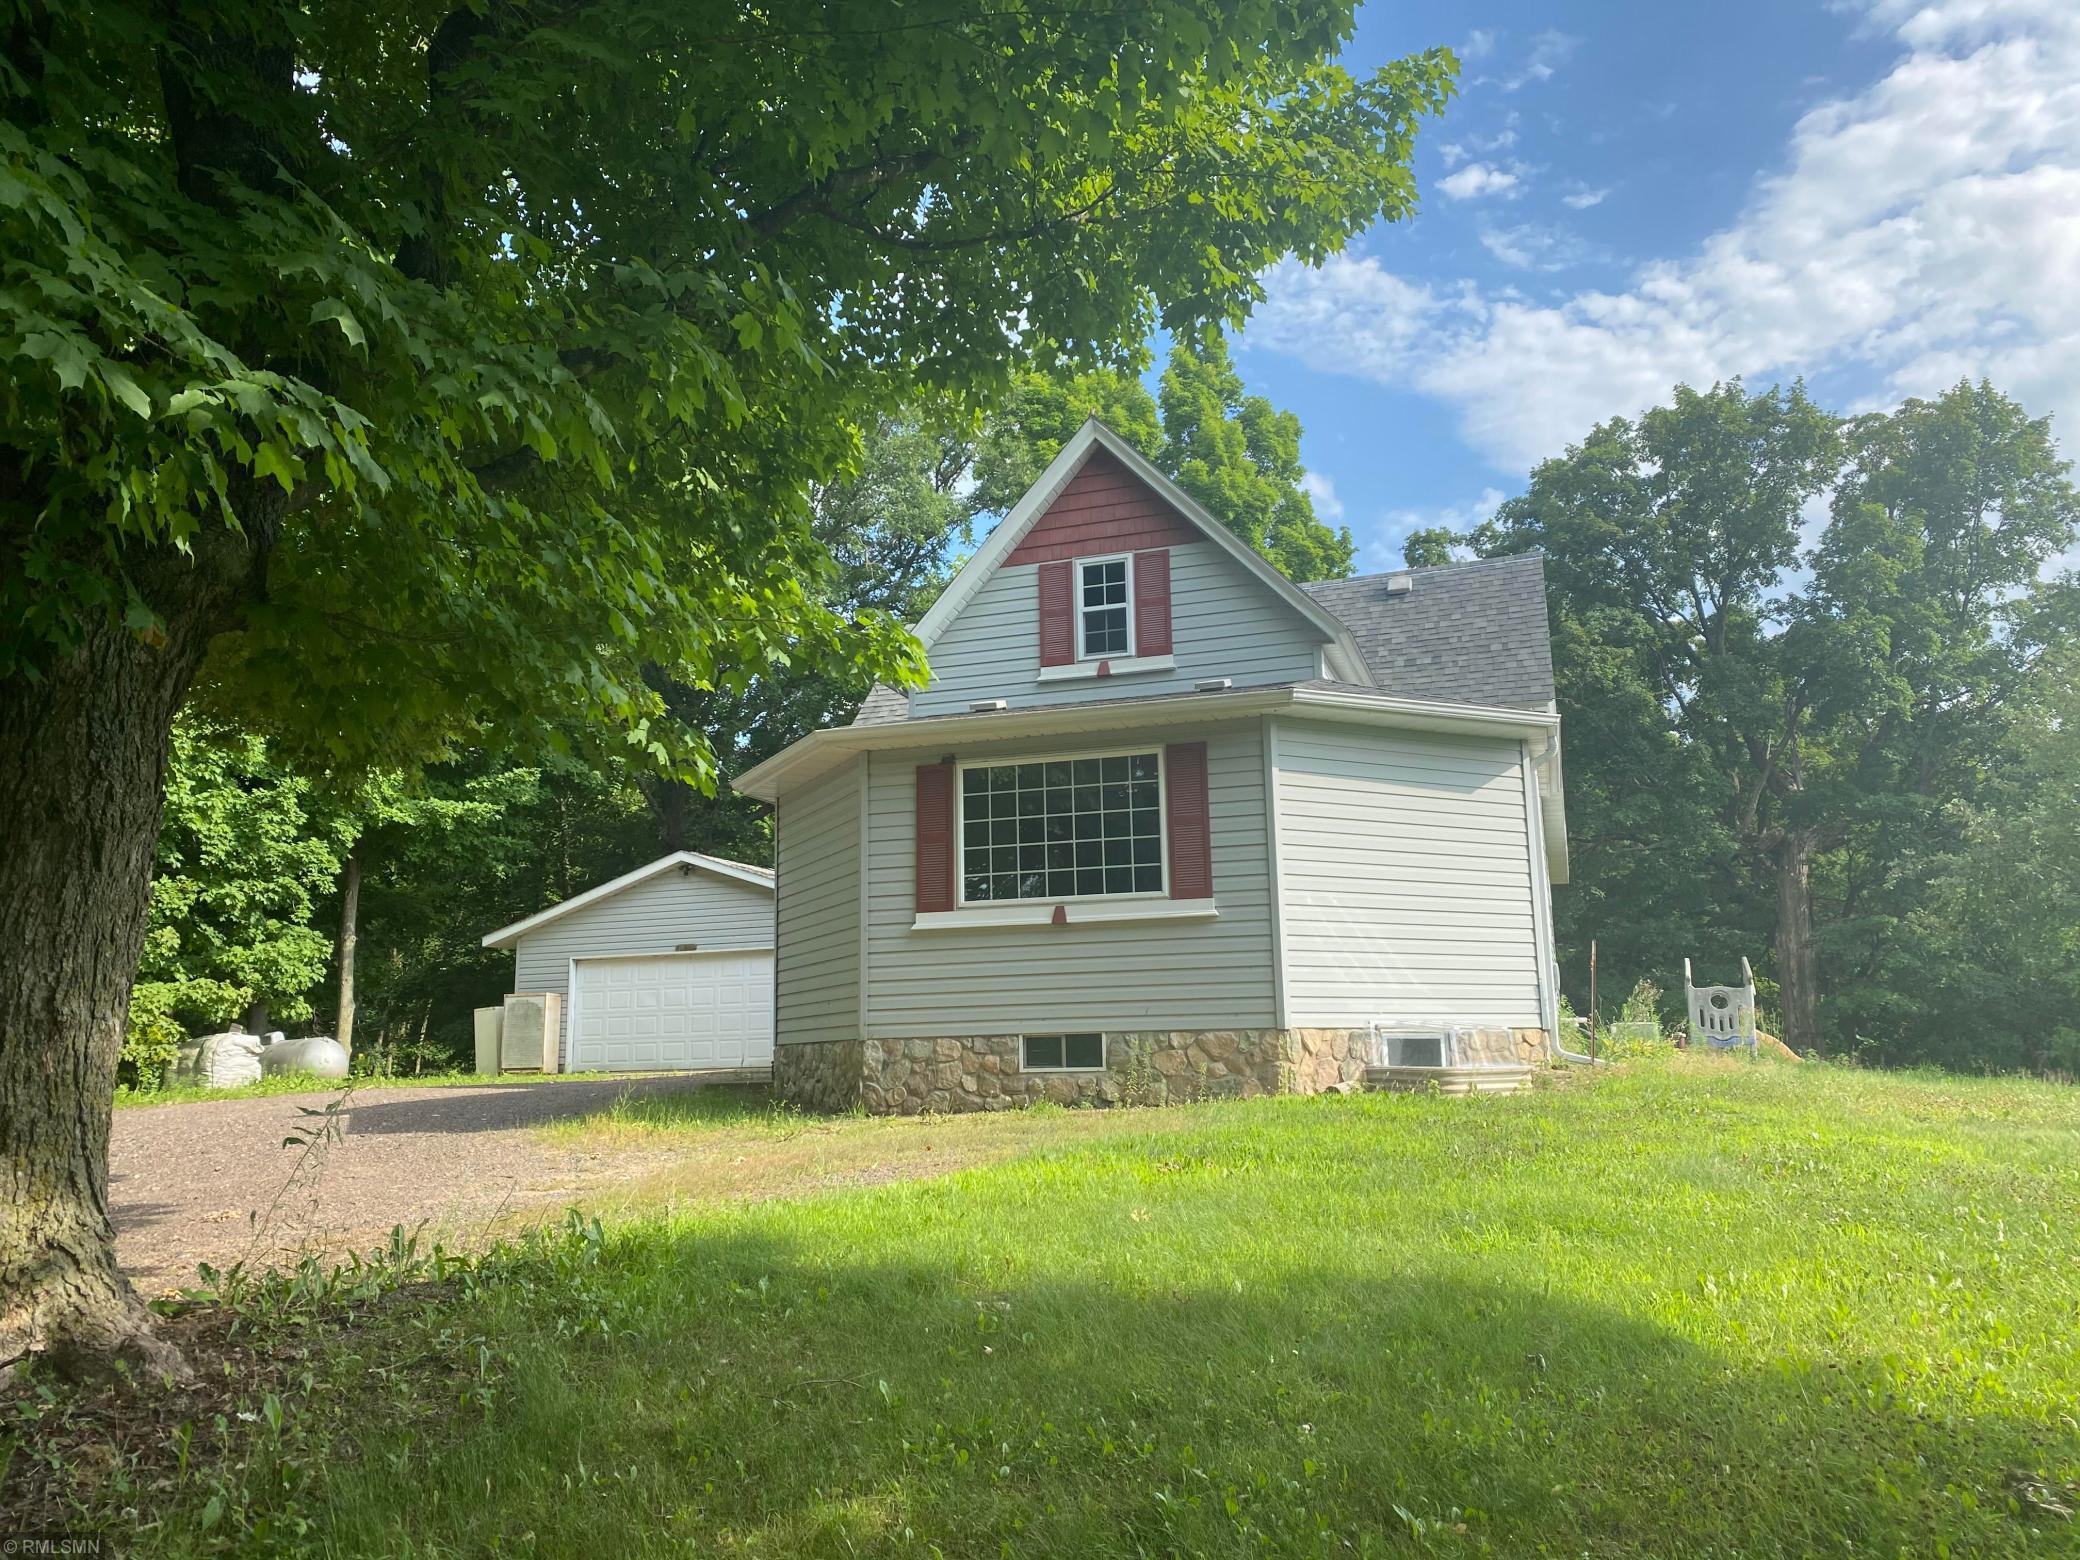 12175 County Road O Property Photo - Trade Lake, WI real estate listing